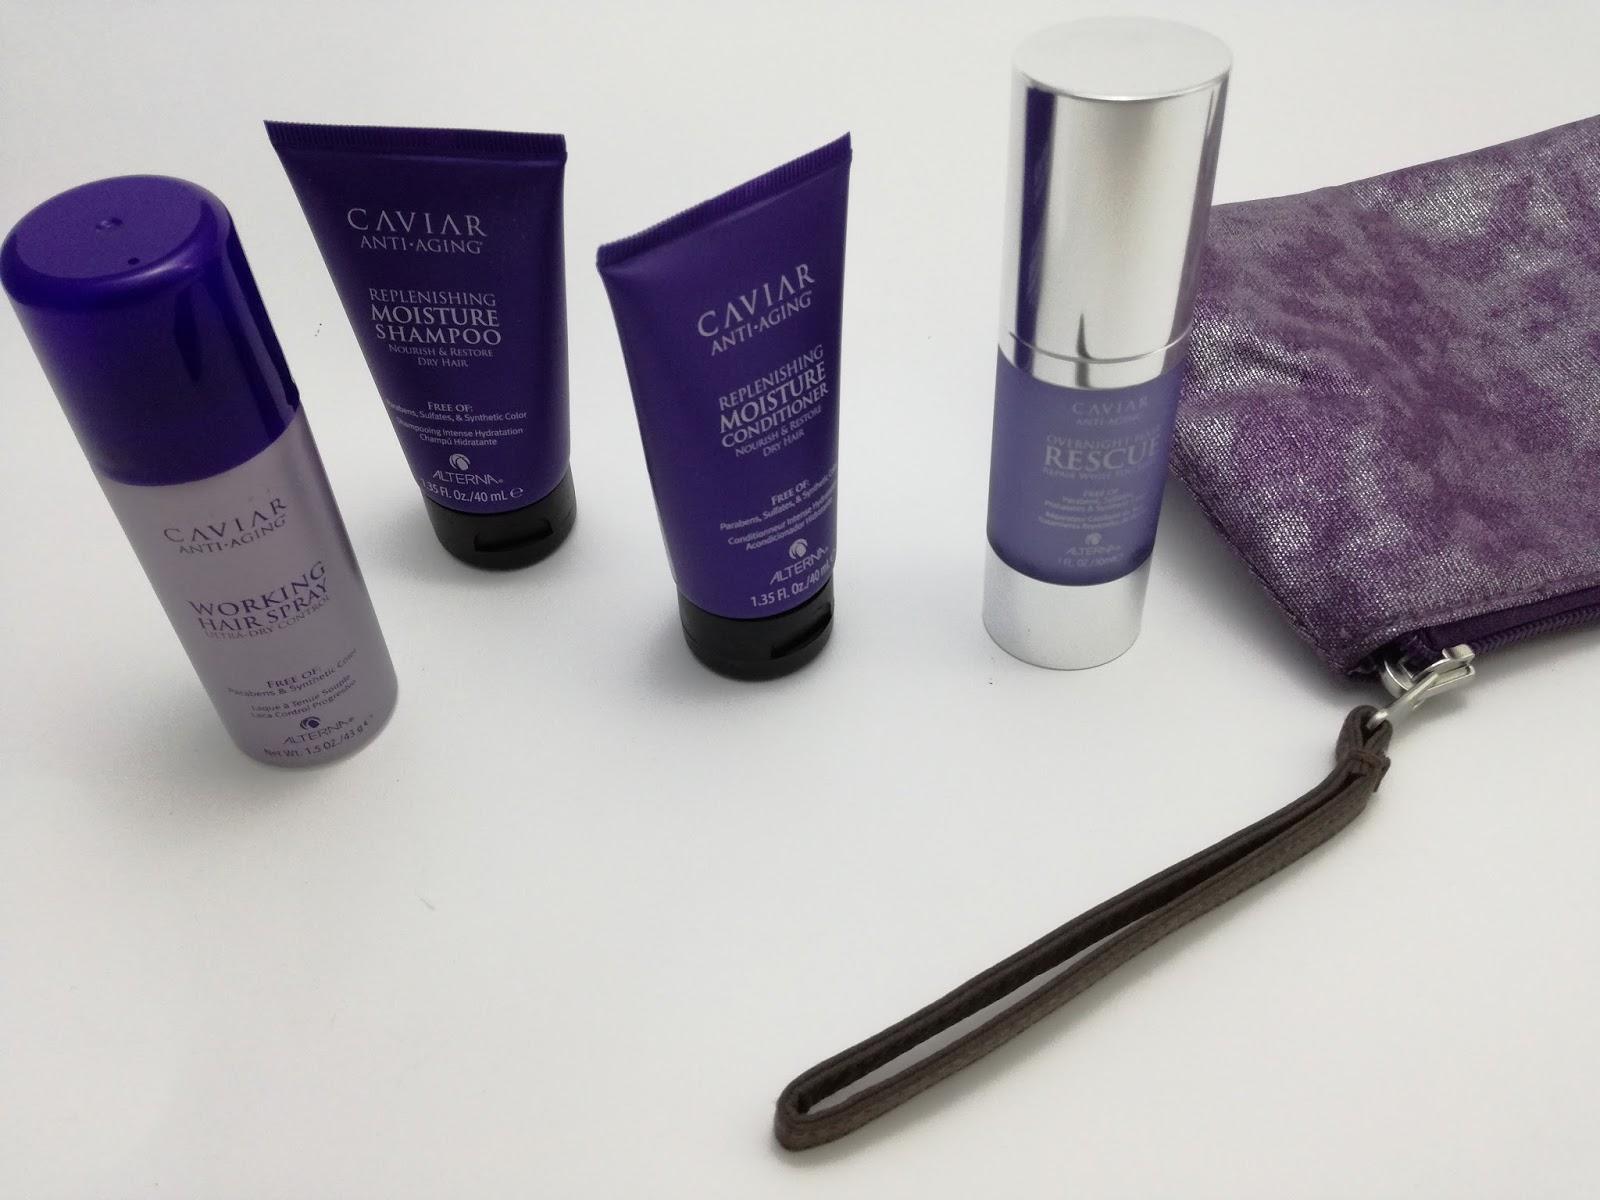 bbmulj-alterna-hair-care-caviar-transformation-kit